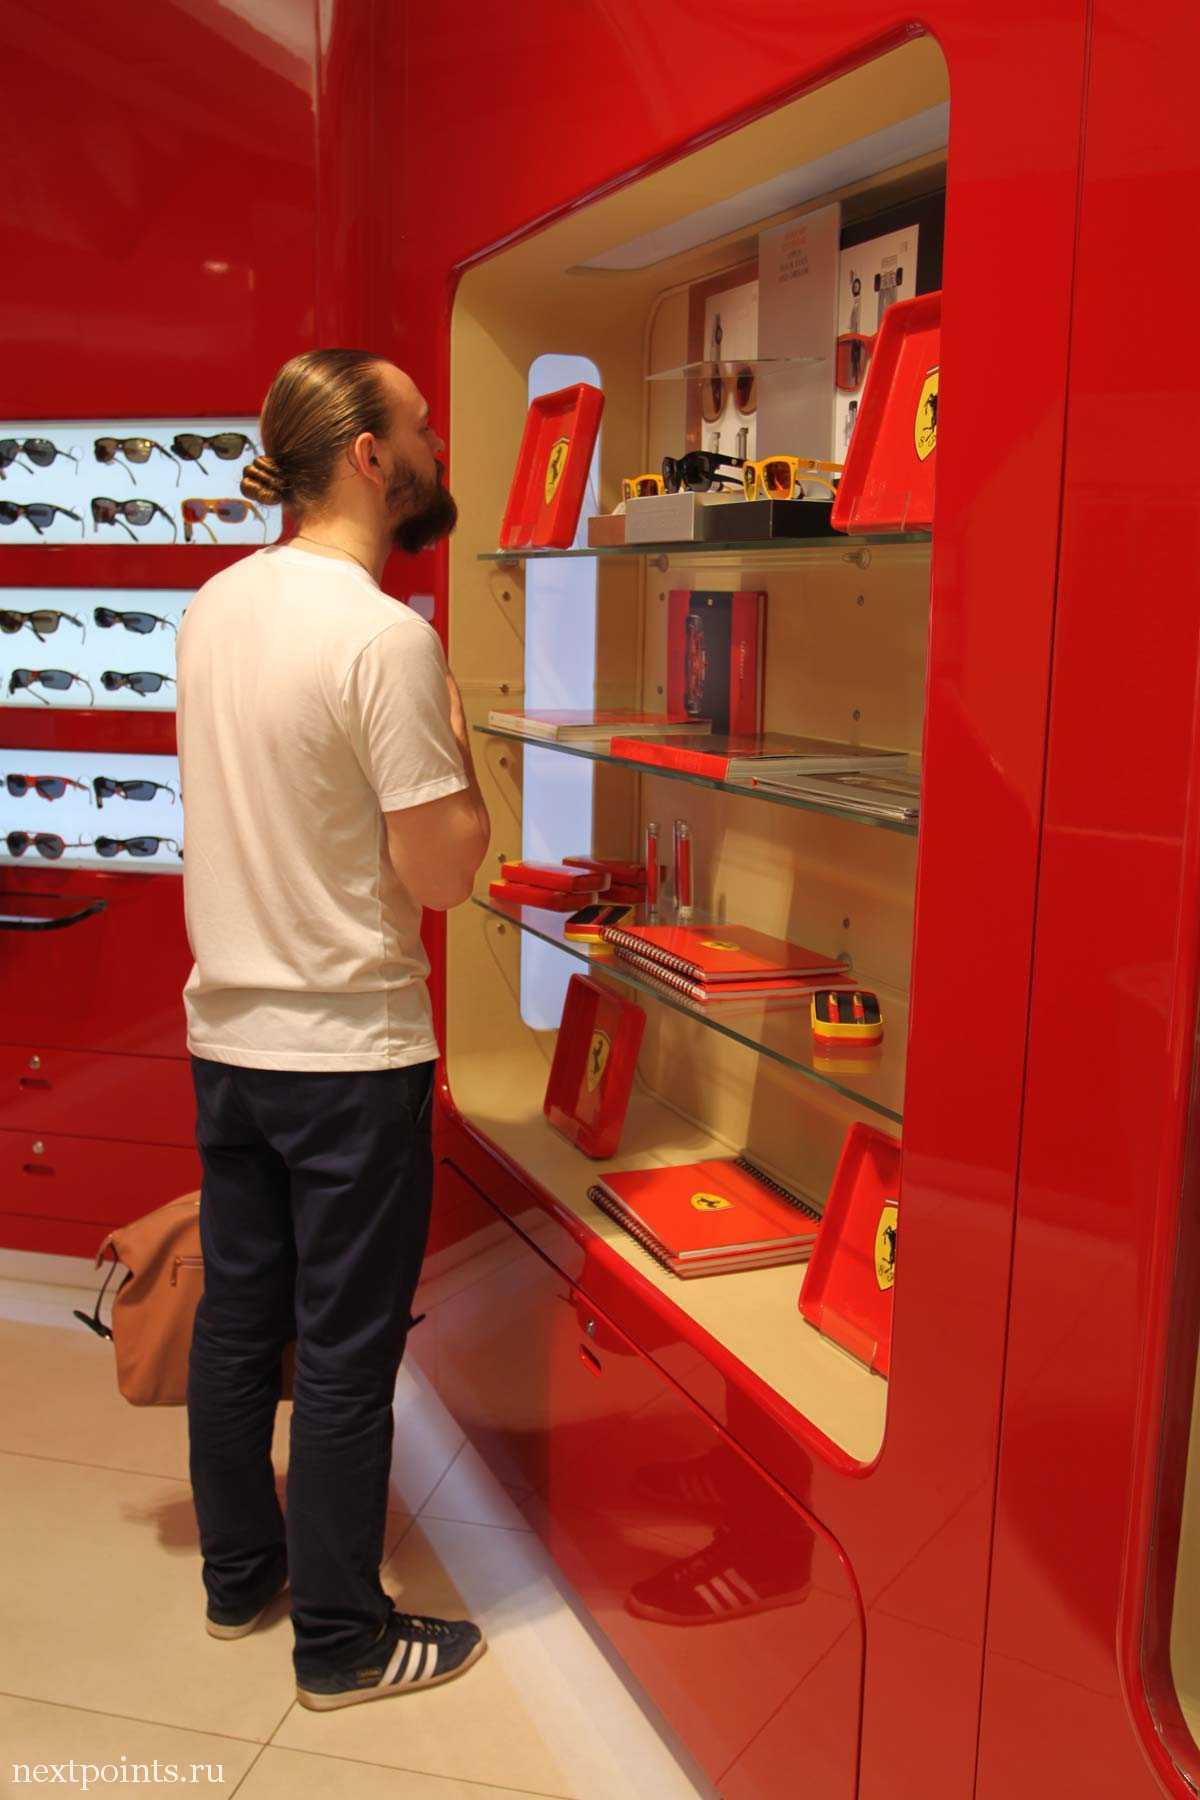 Фирменный магазин Скудерии Феррари в аэропорту Барселоны